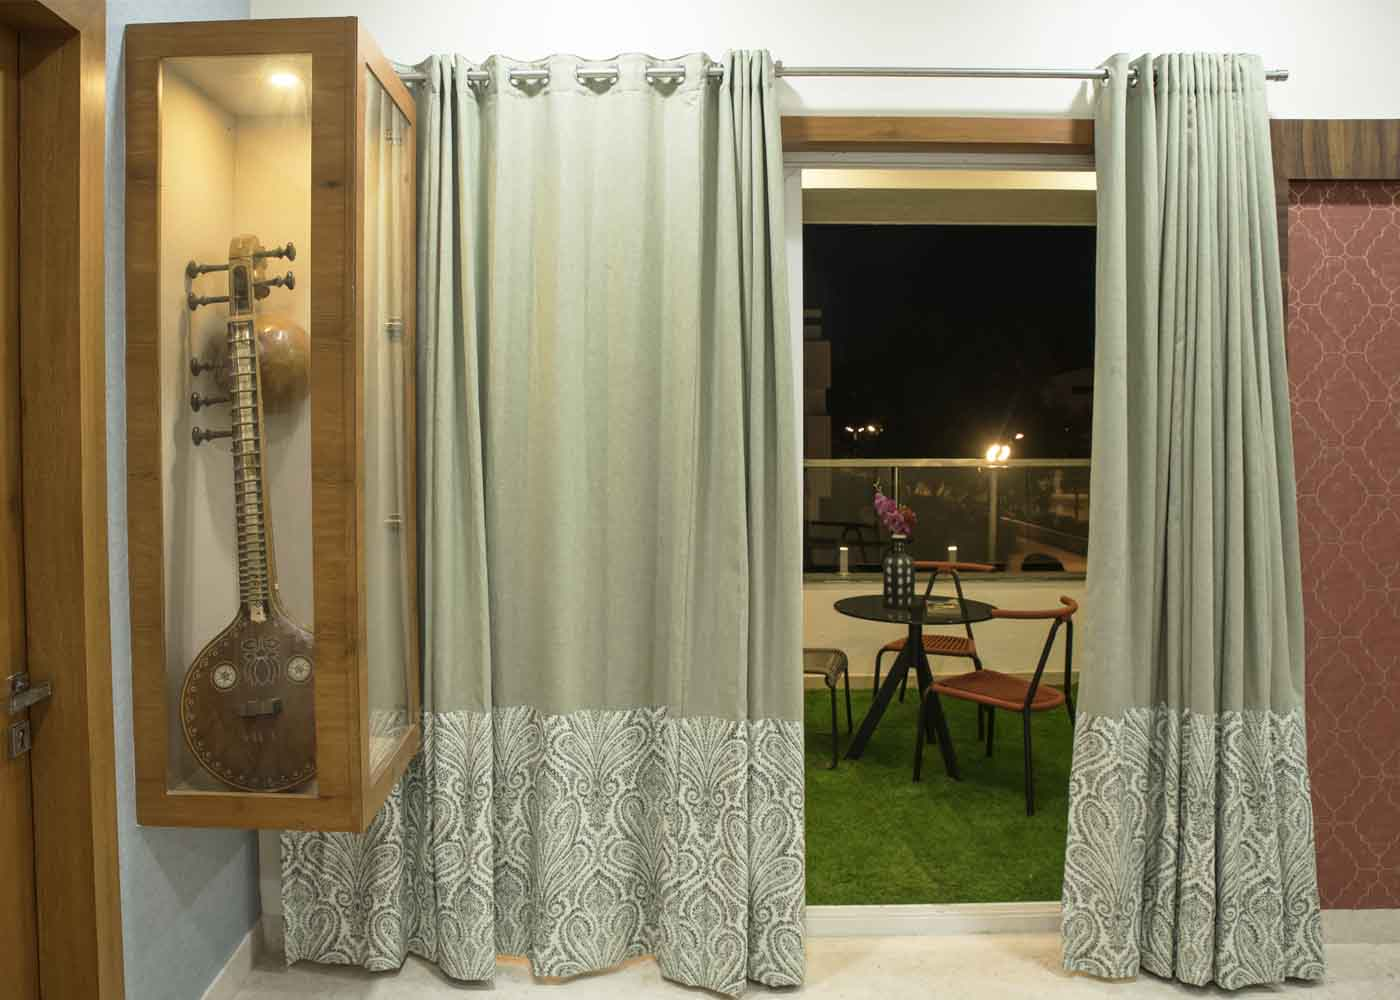 Essential Elements Of Traditional Indian Interior Designers Cuttingedge